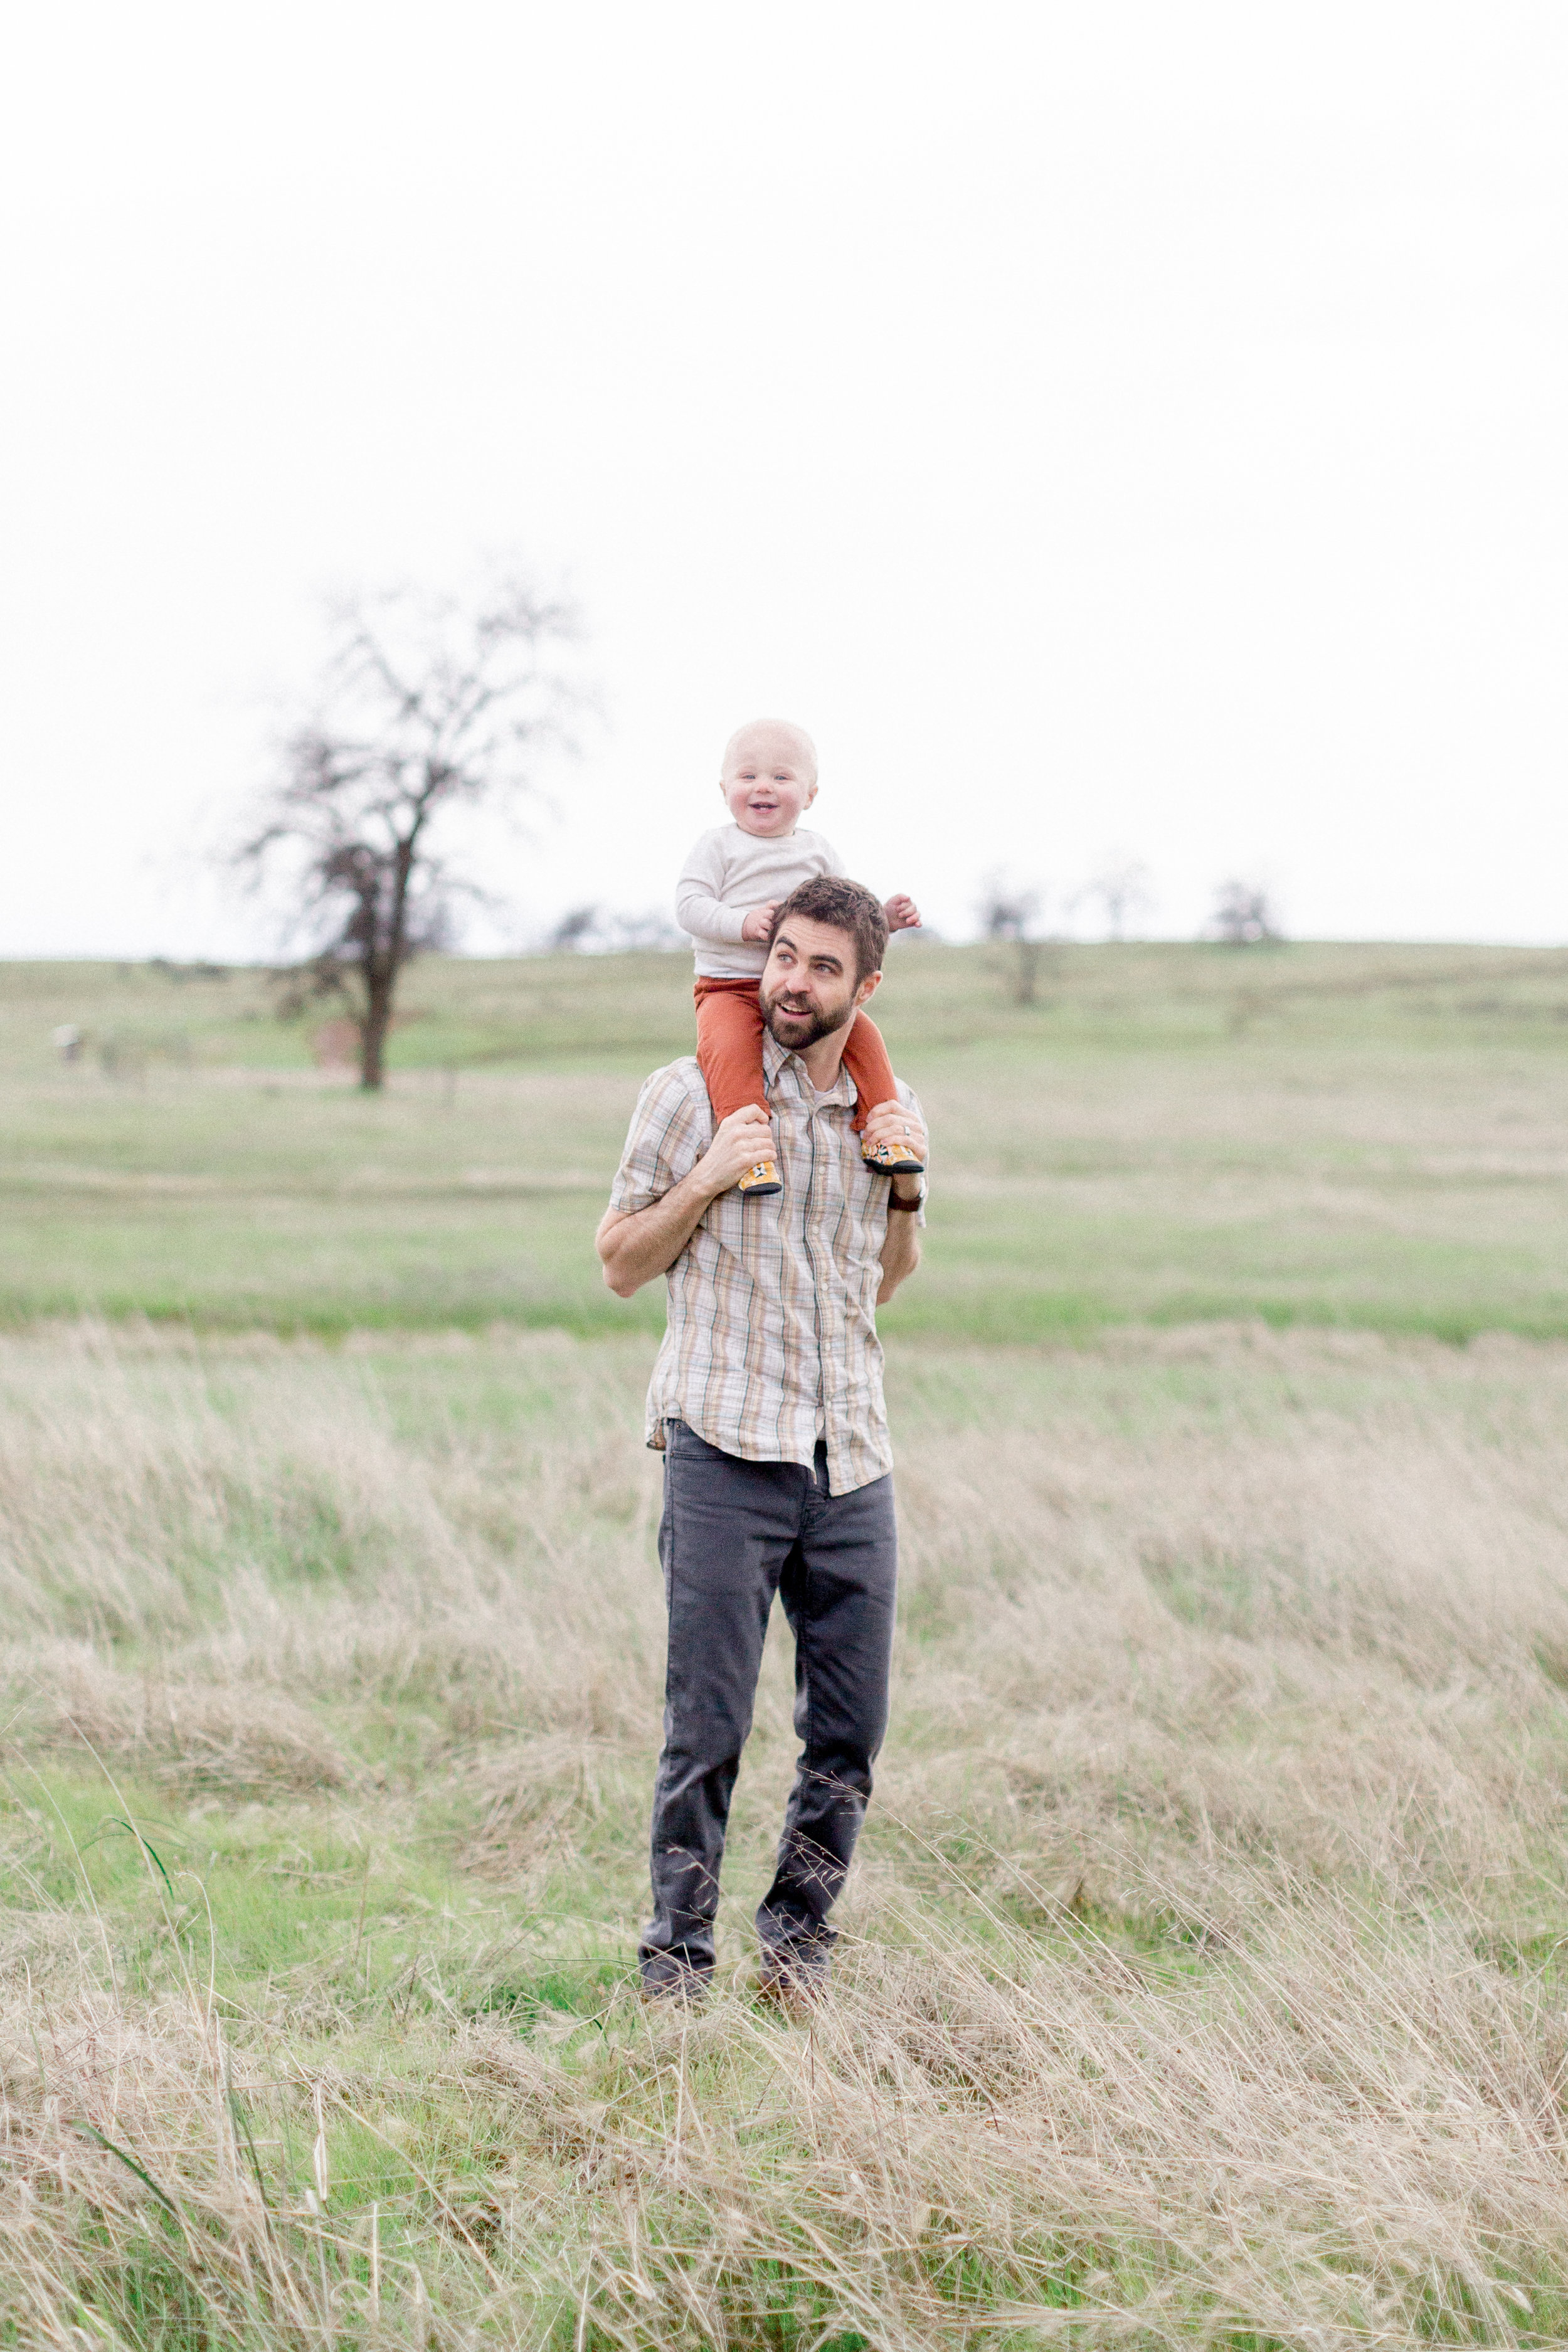 father-son-take-photos-togetherjpg